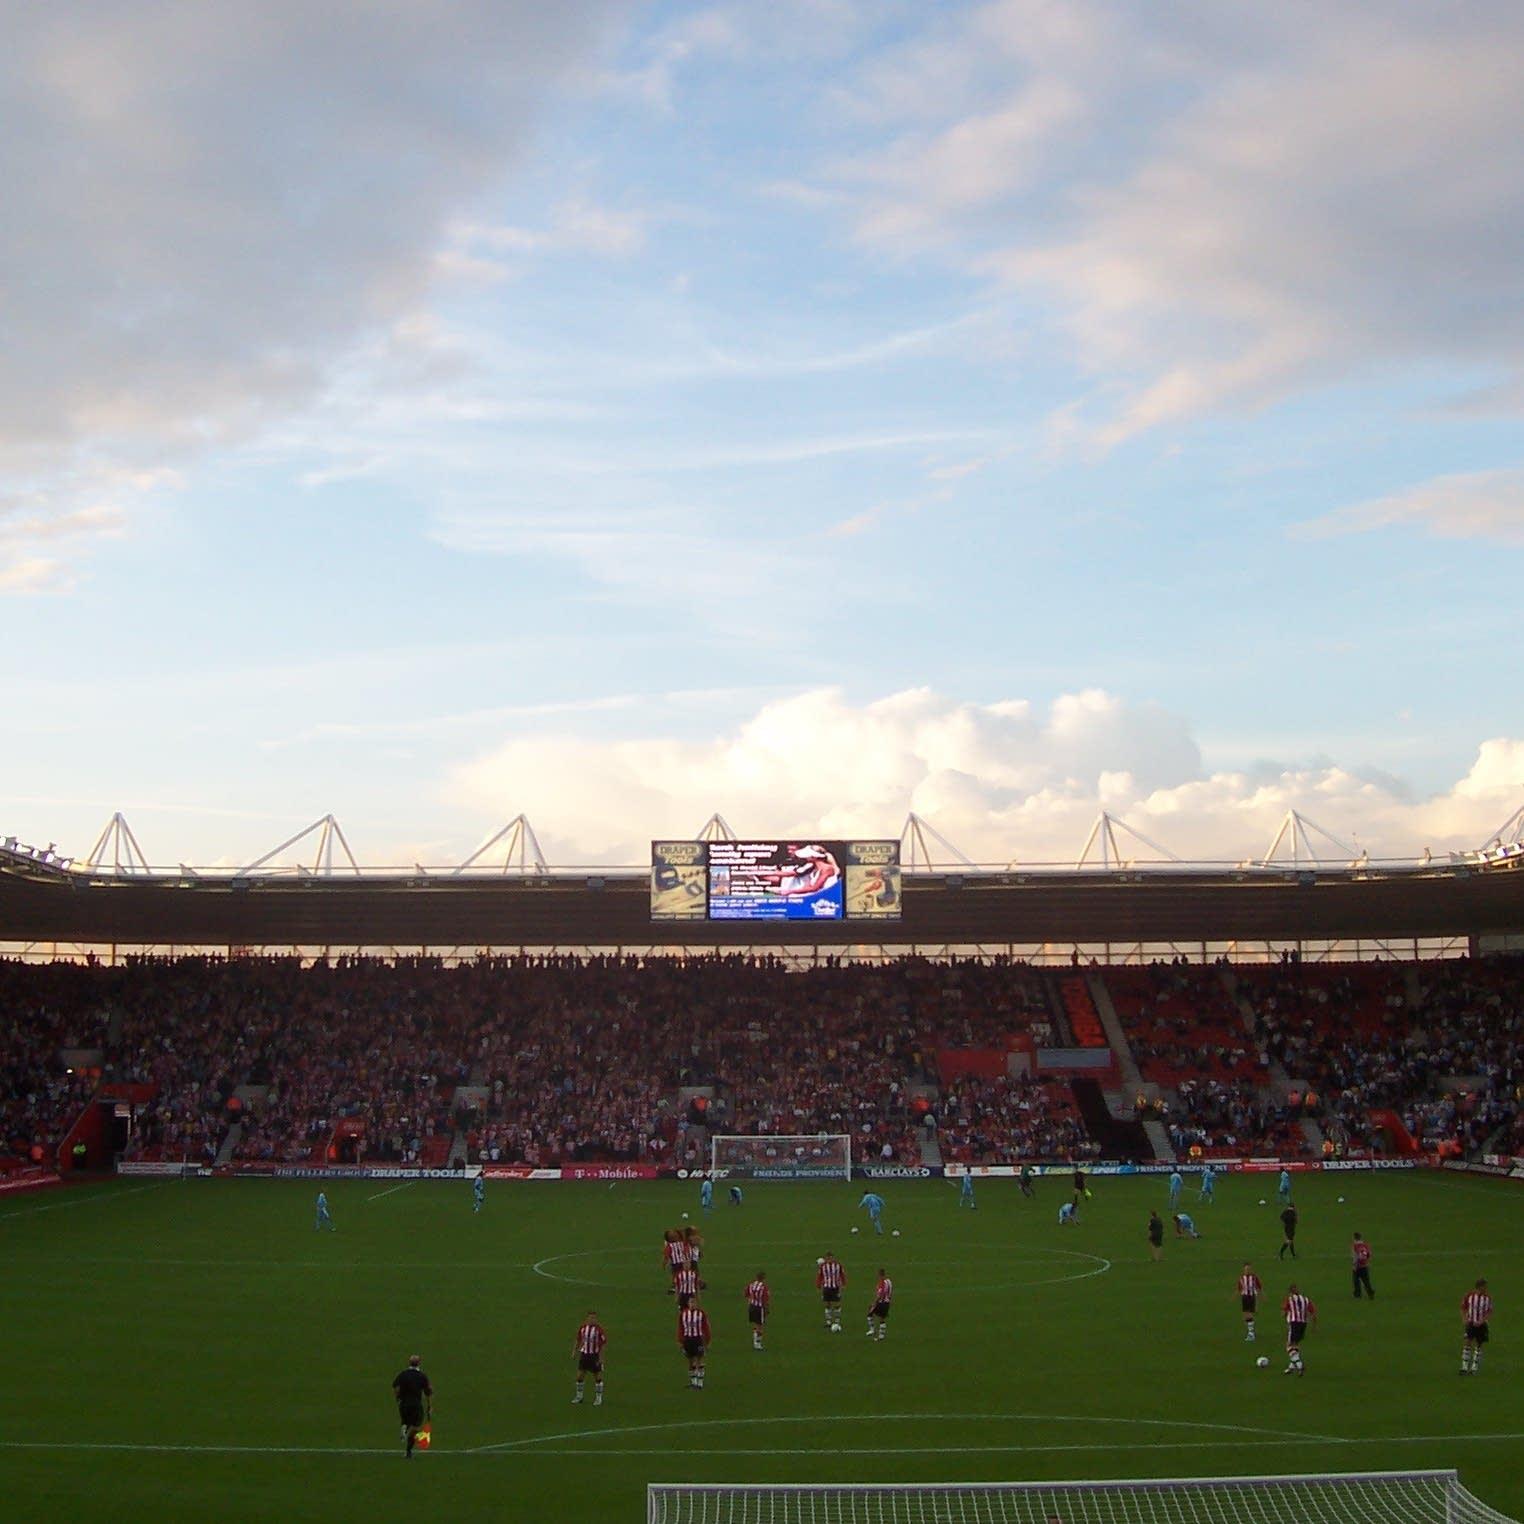 Friends Provident St. Mary's Stadium